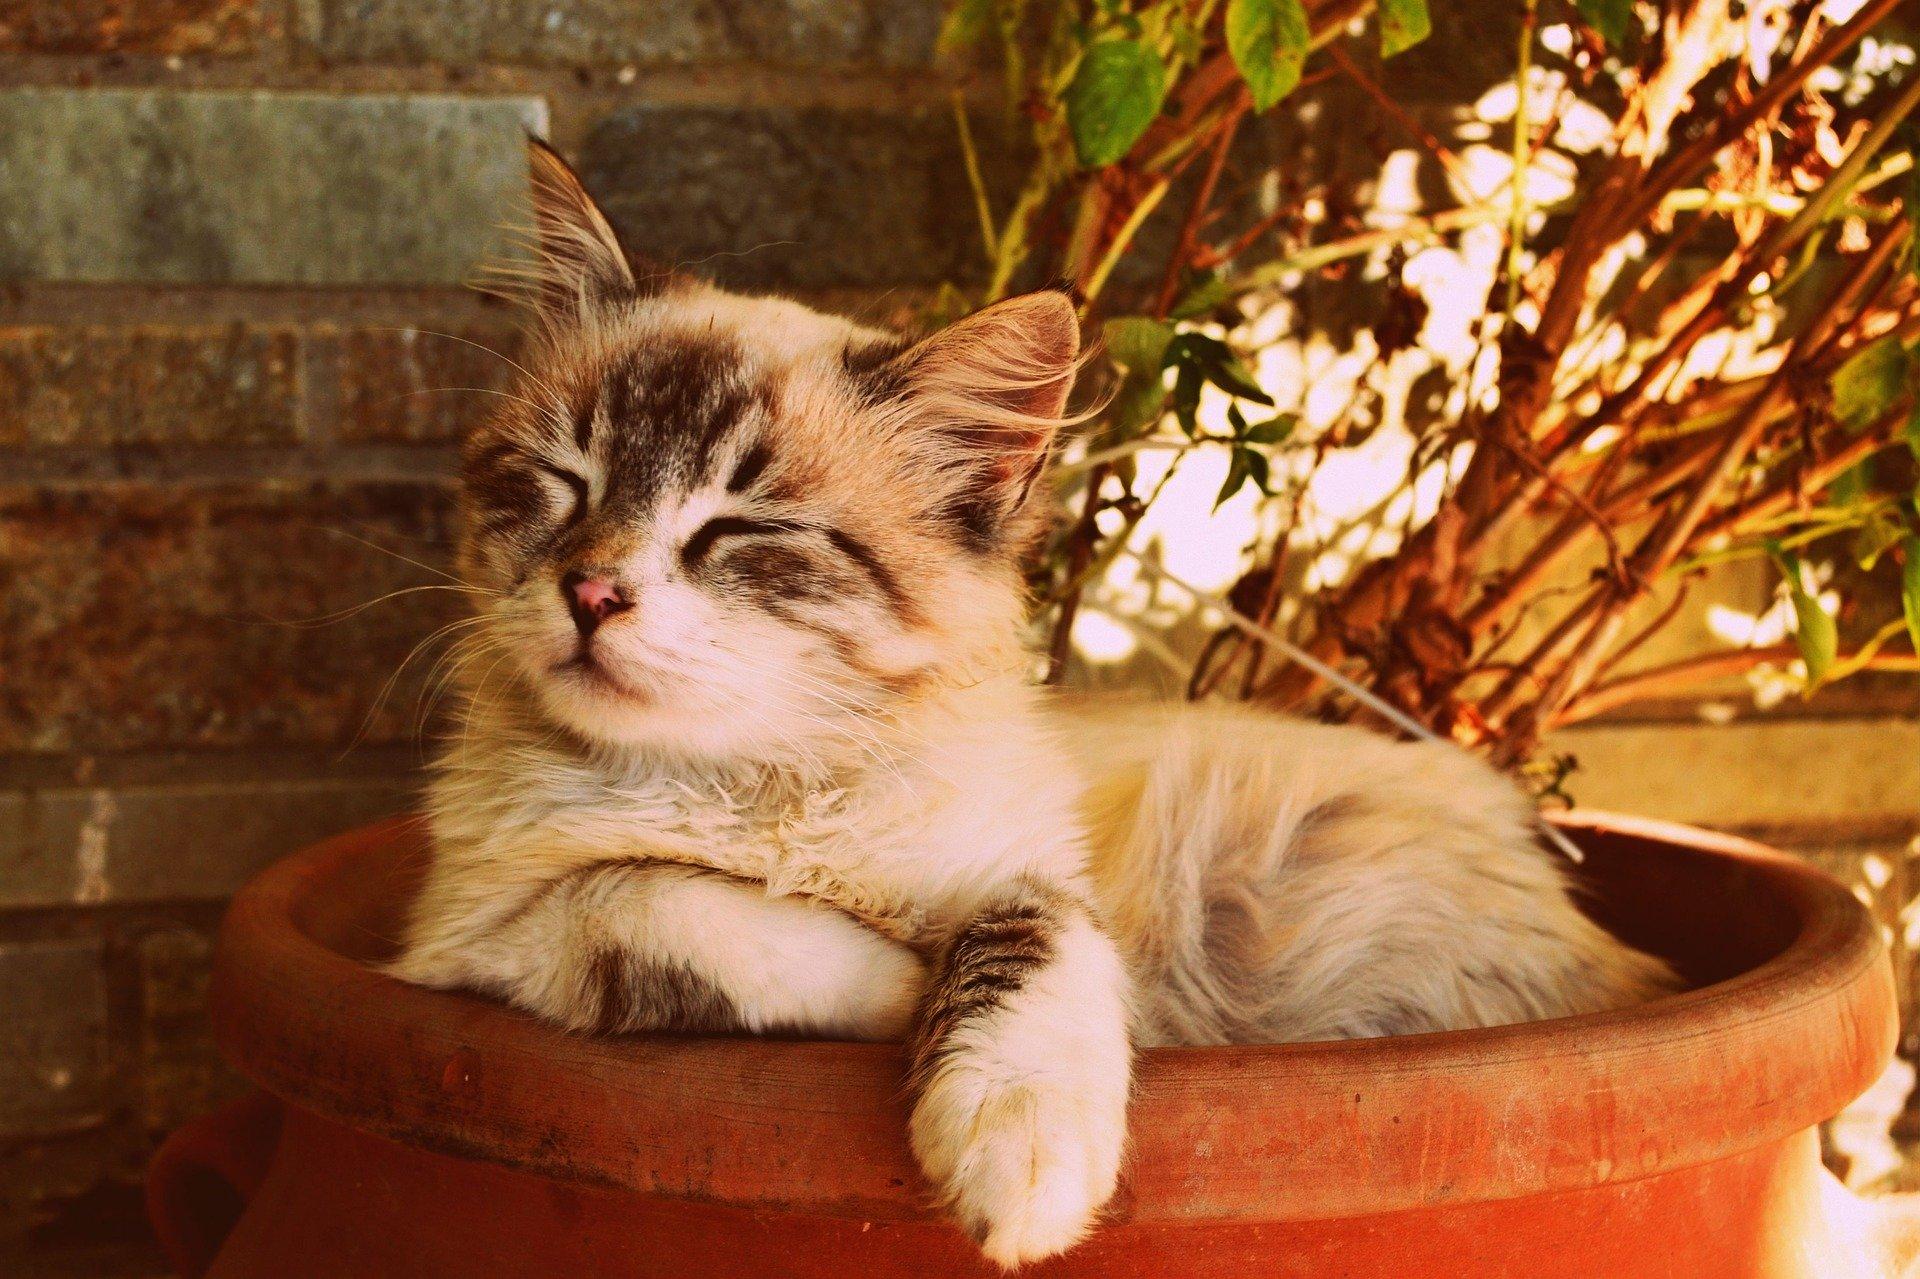 Hay muchas causas de muerte súbita en gatos